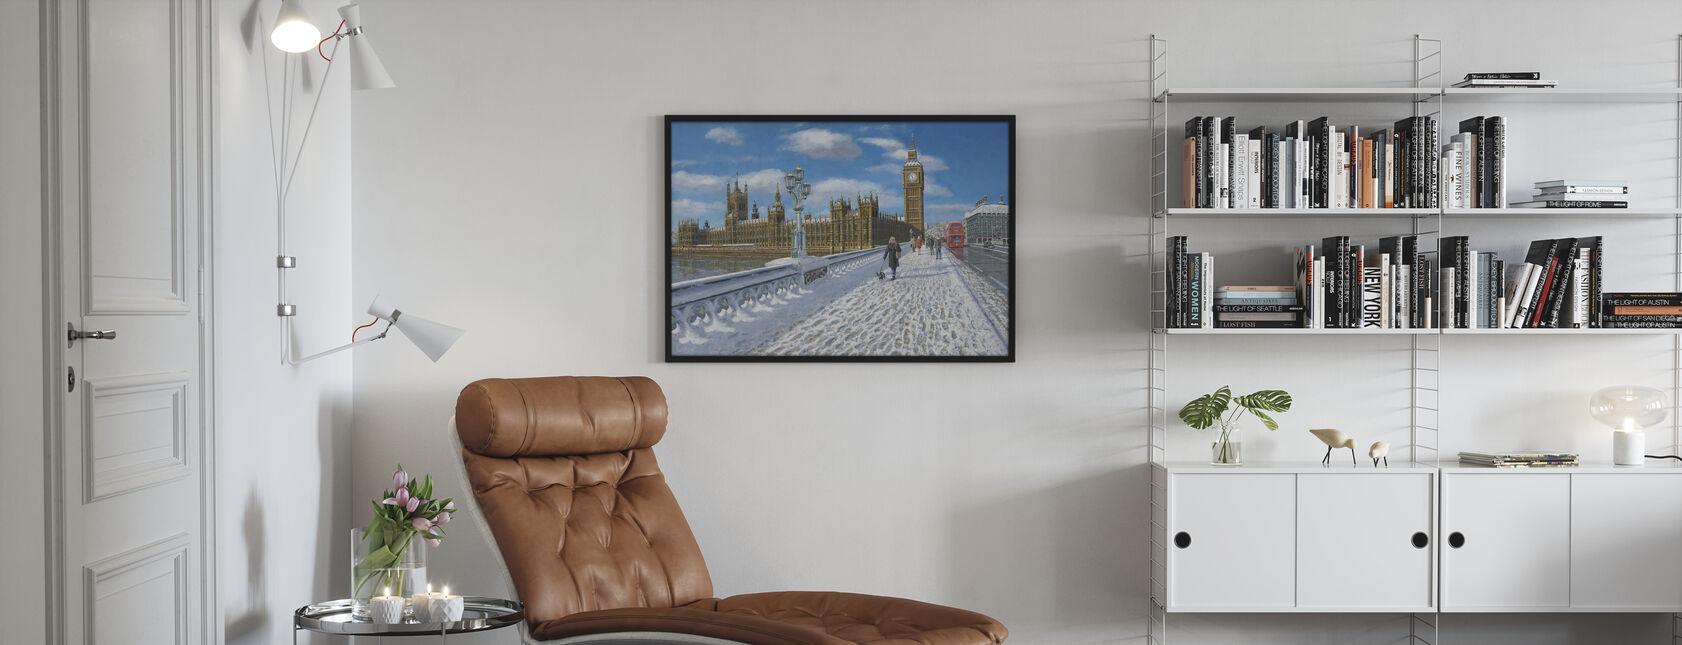 Winter sun Houses of Parliament - London - Poster - Wohnzimmer